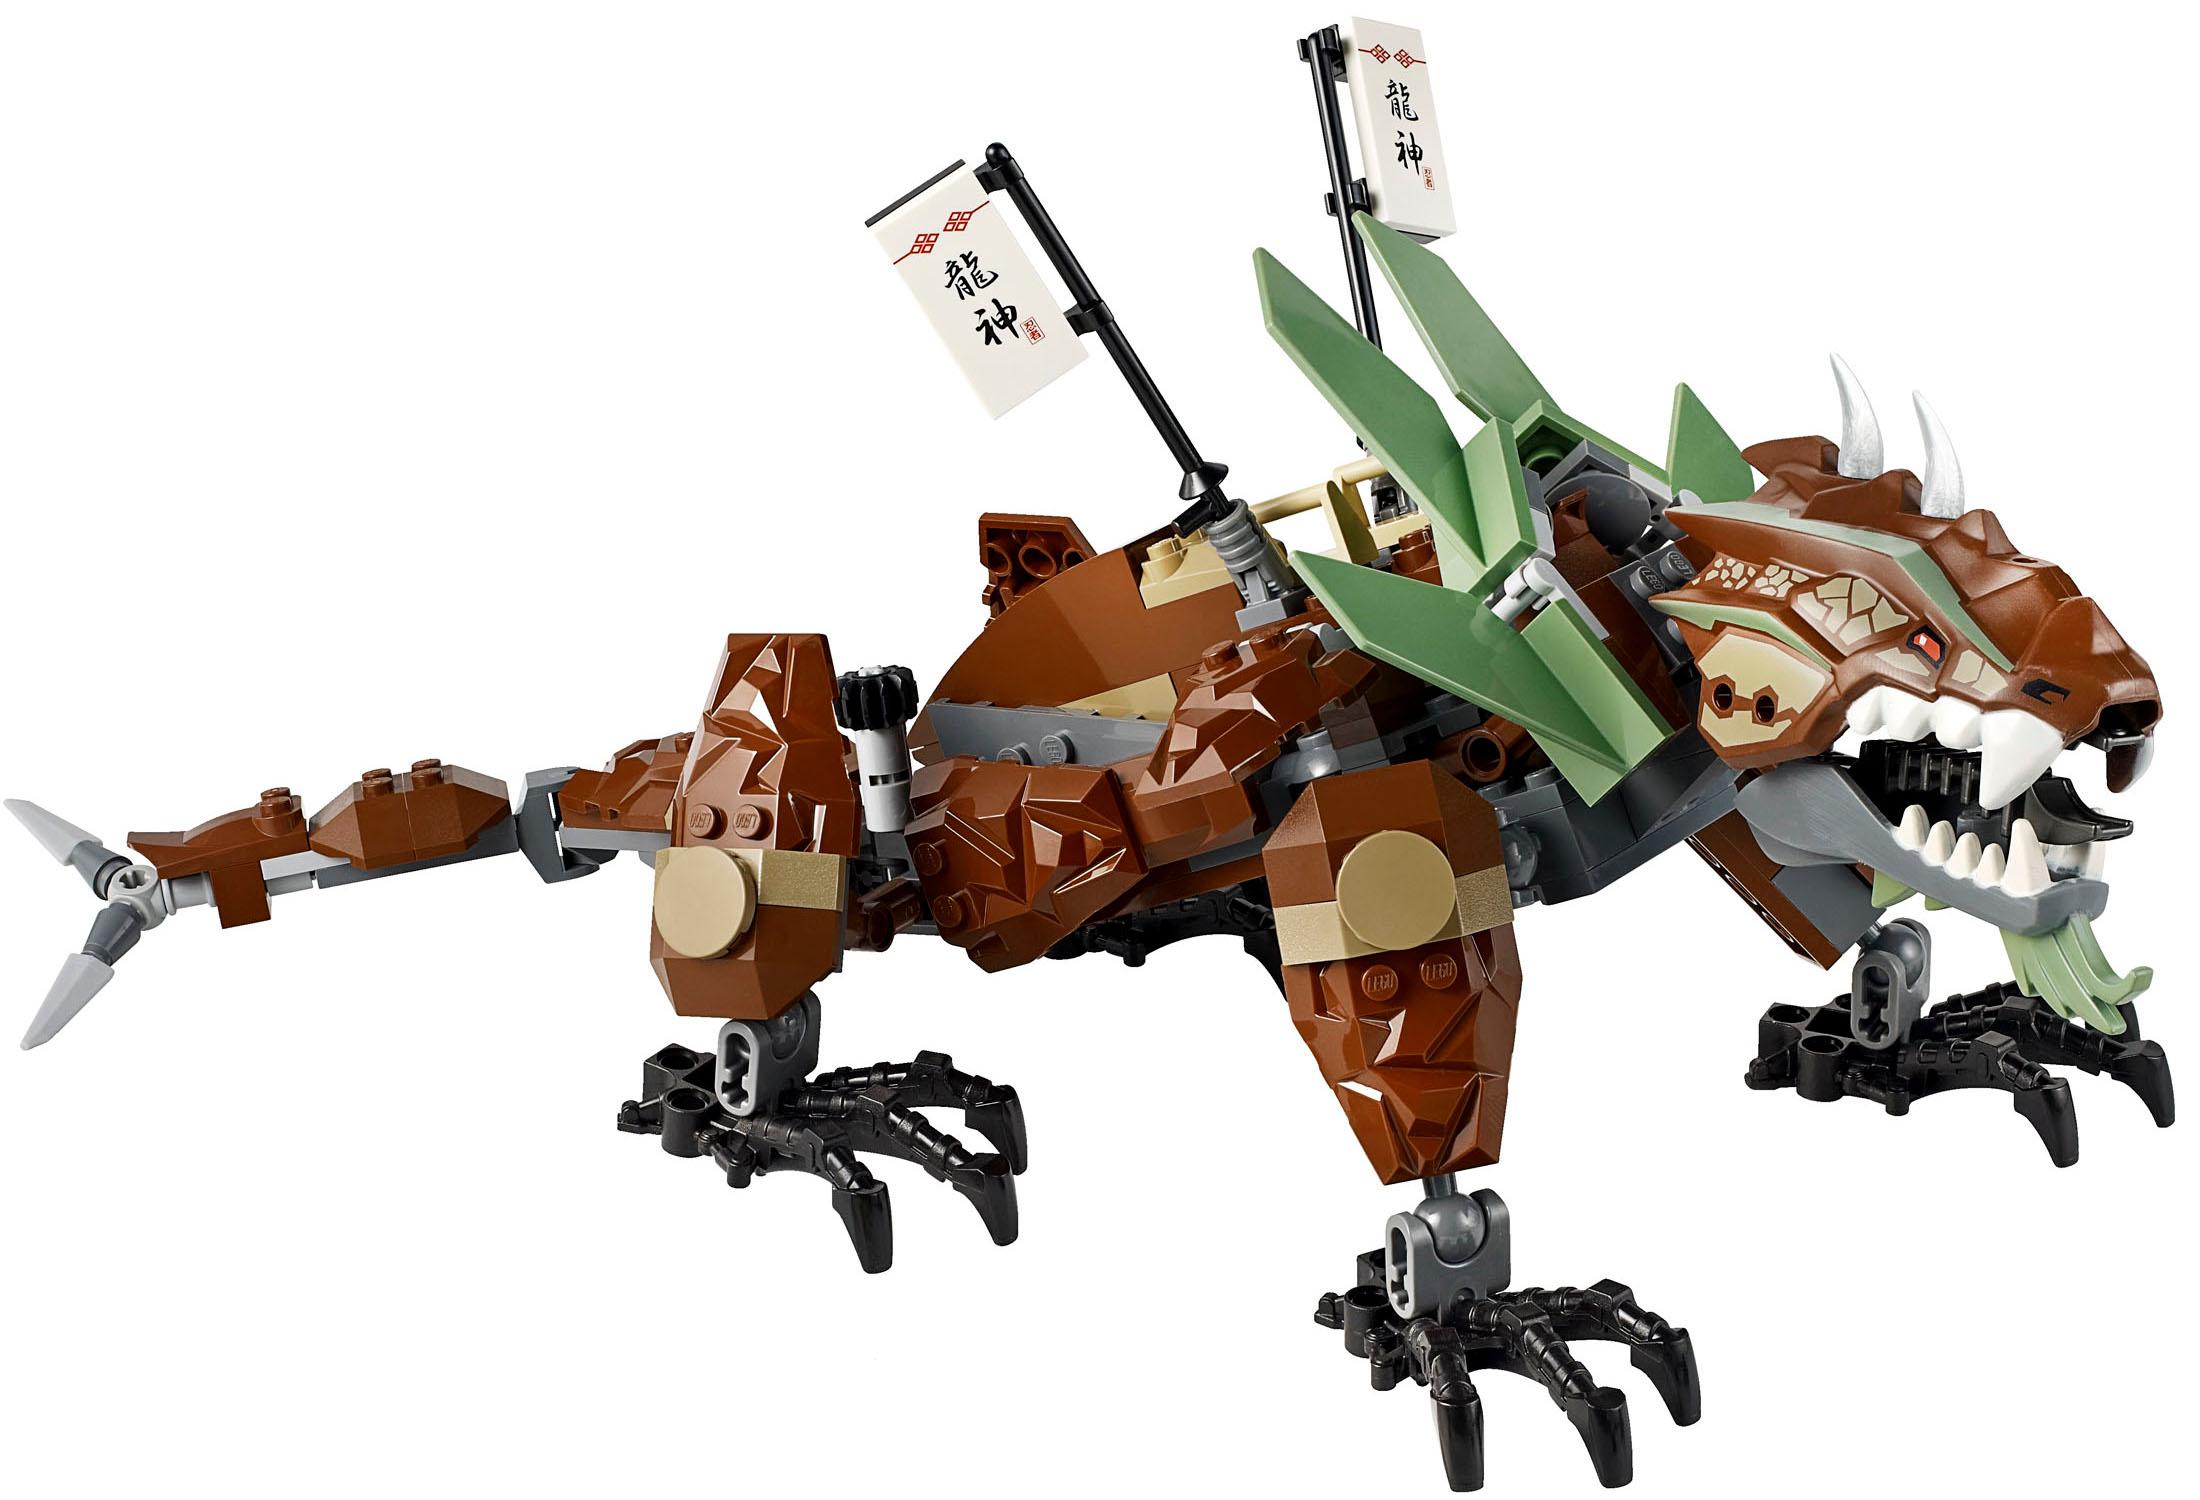 Lego Ninjago Dragon Dragon s tail attack